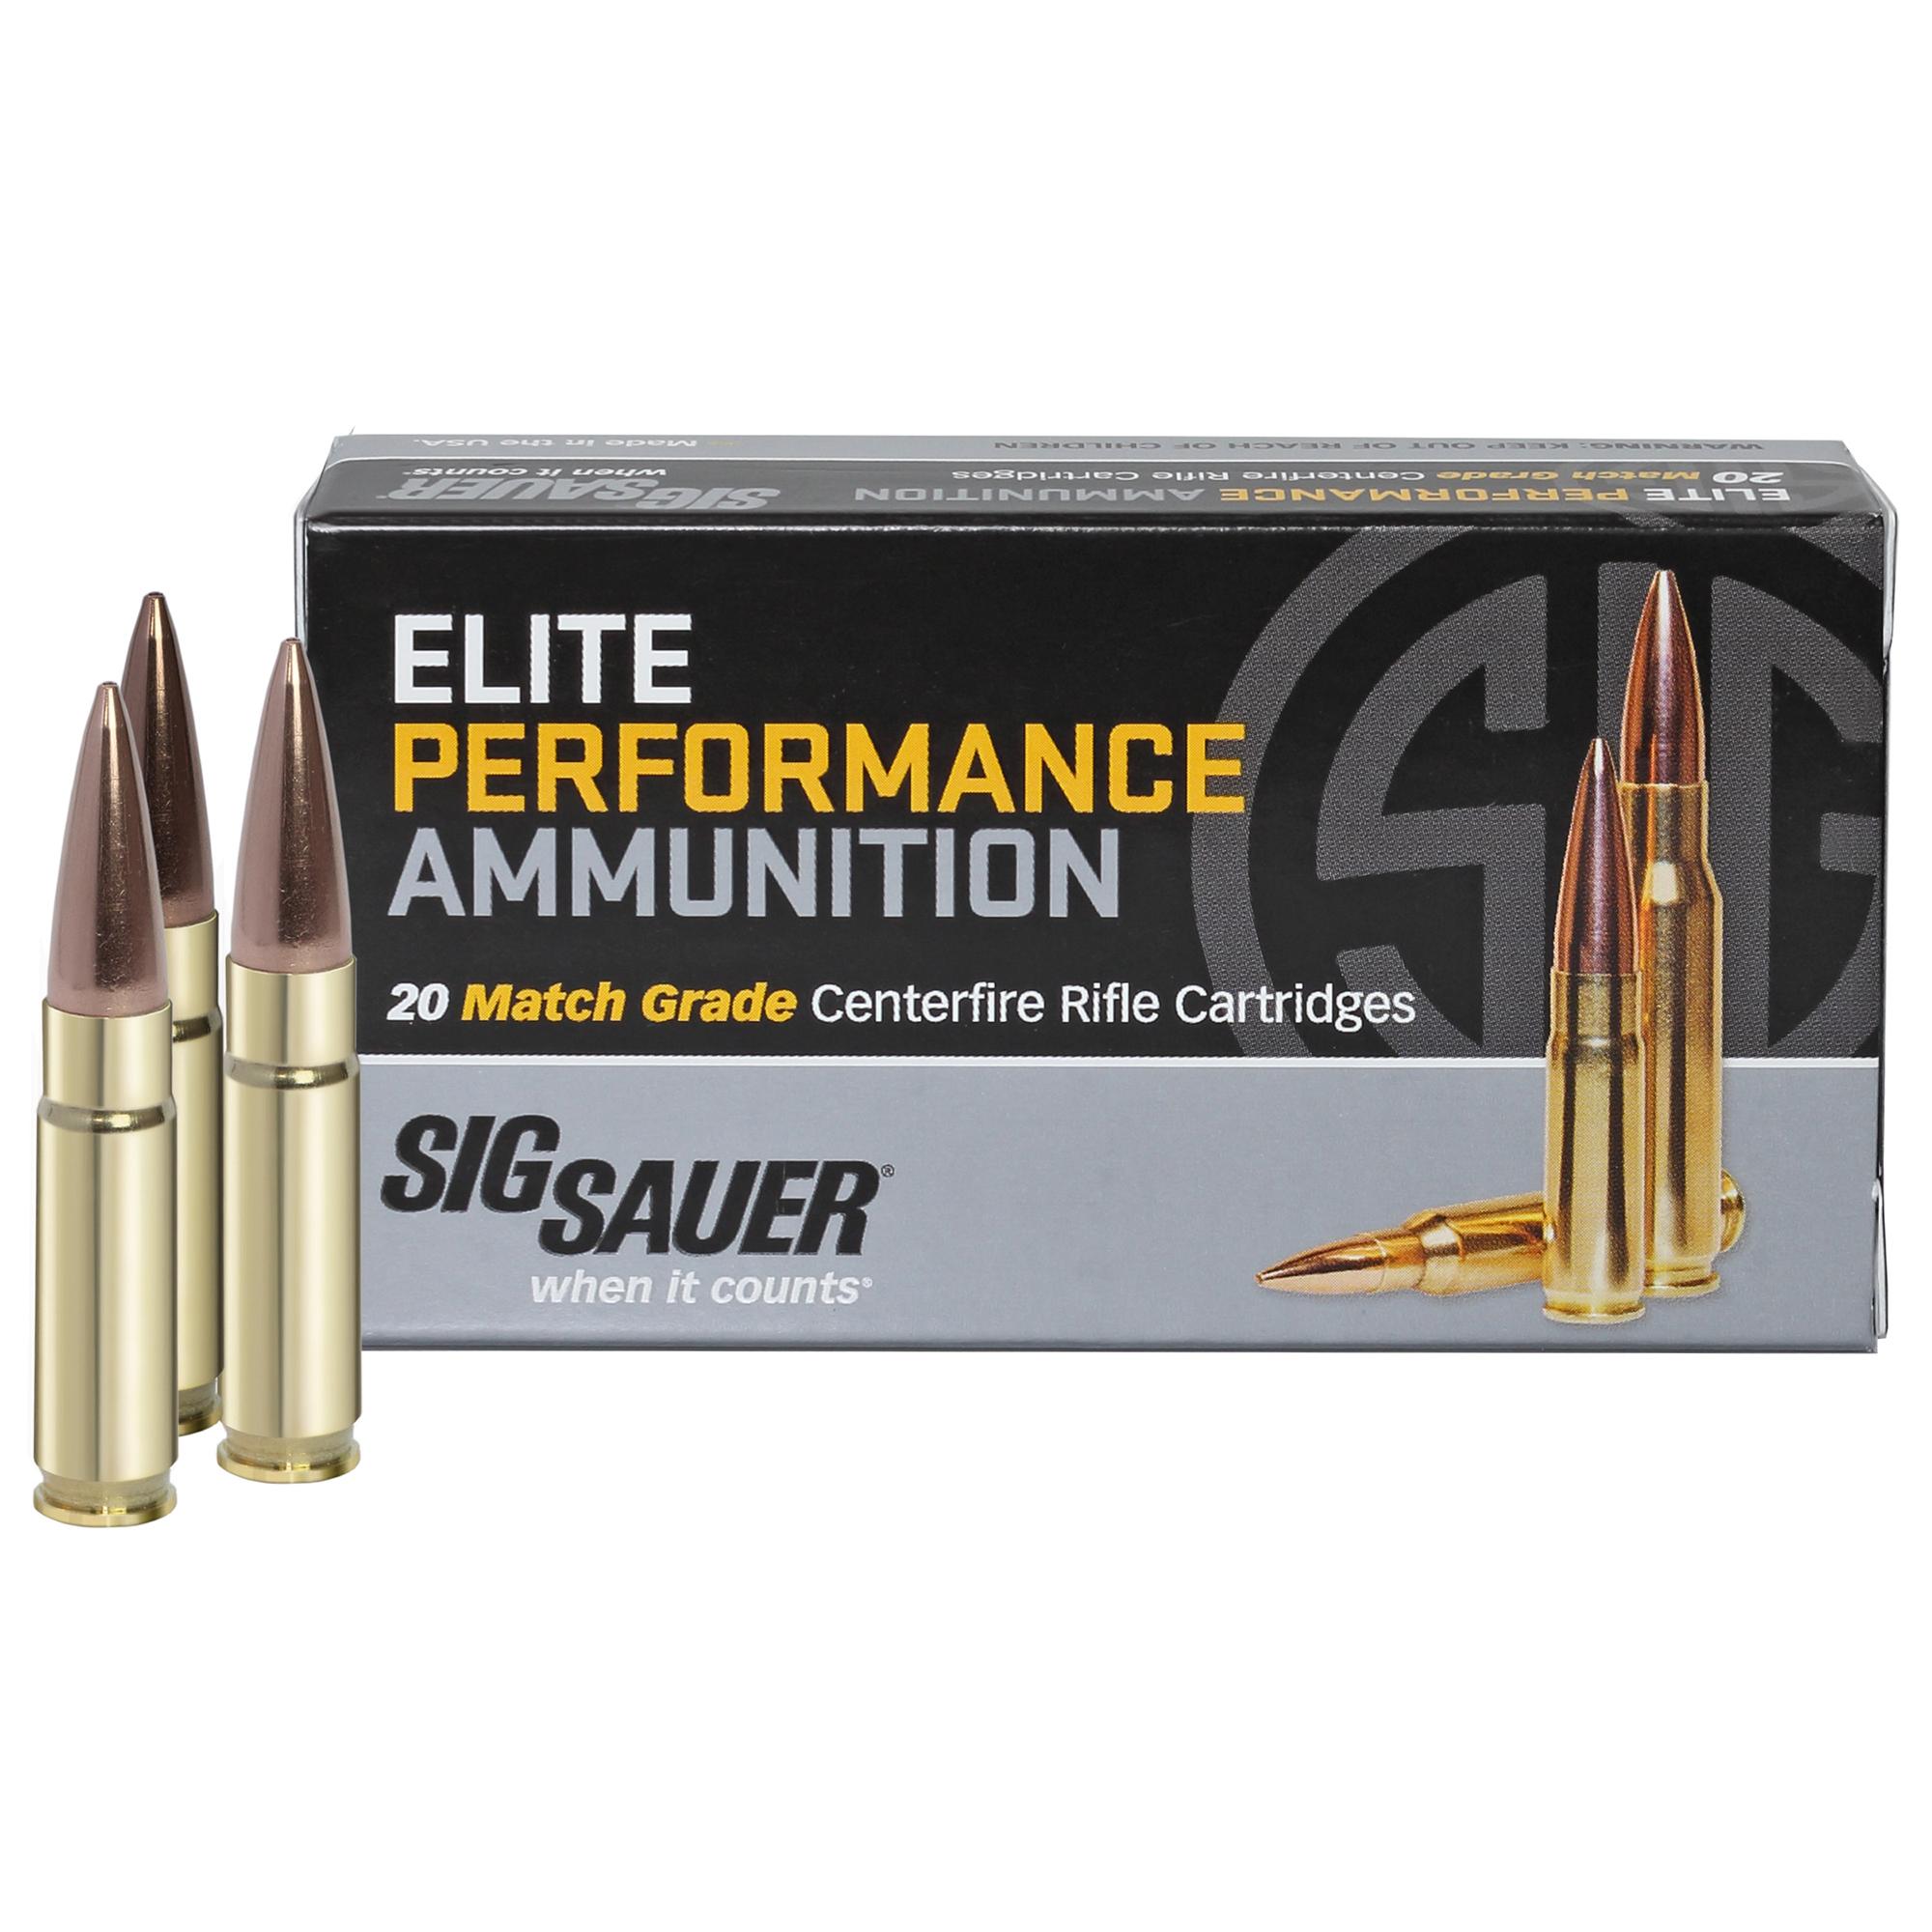 SIG Sauer Elite Performance Match Ammo, .300 AAC Blackout, 125-gr, Supersonic